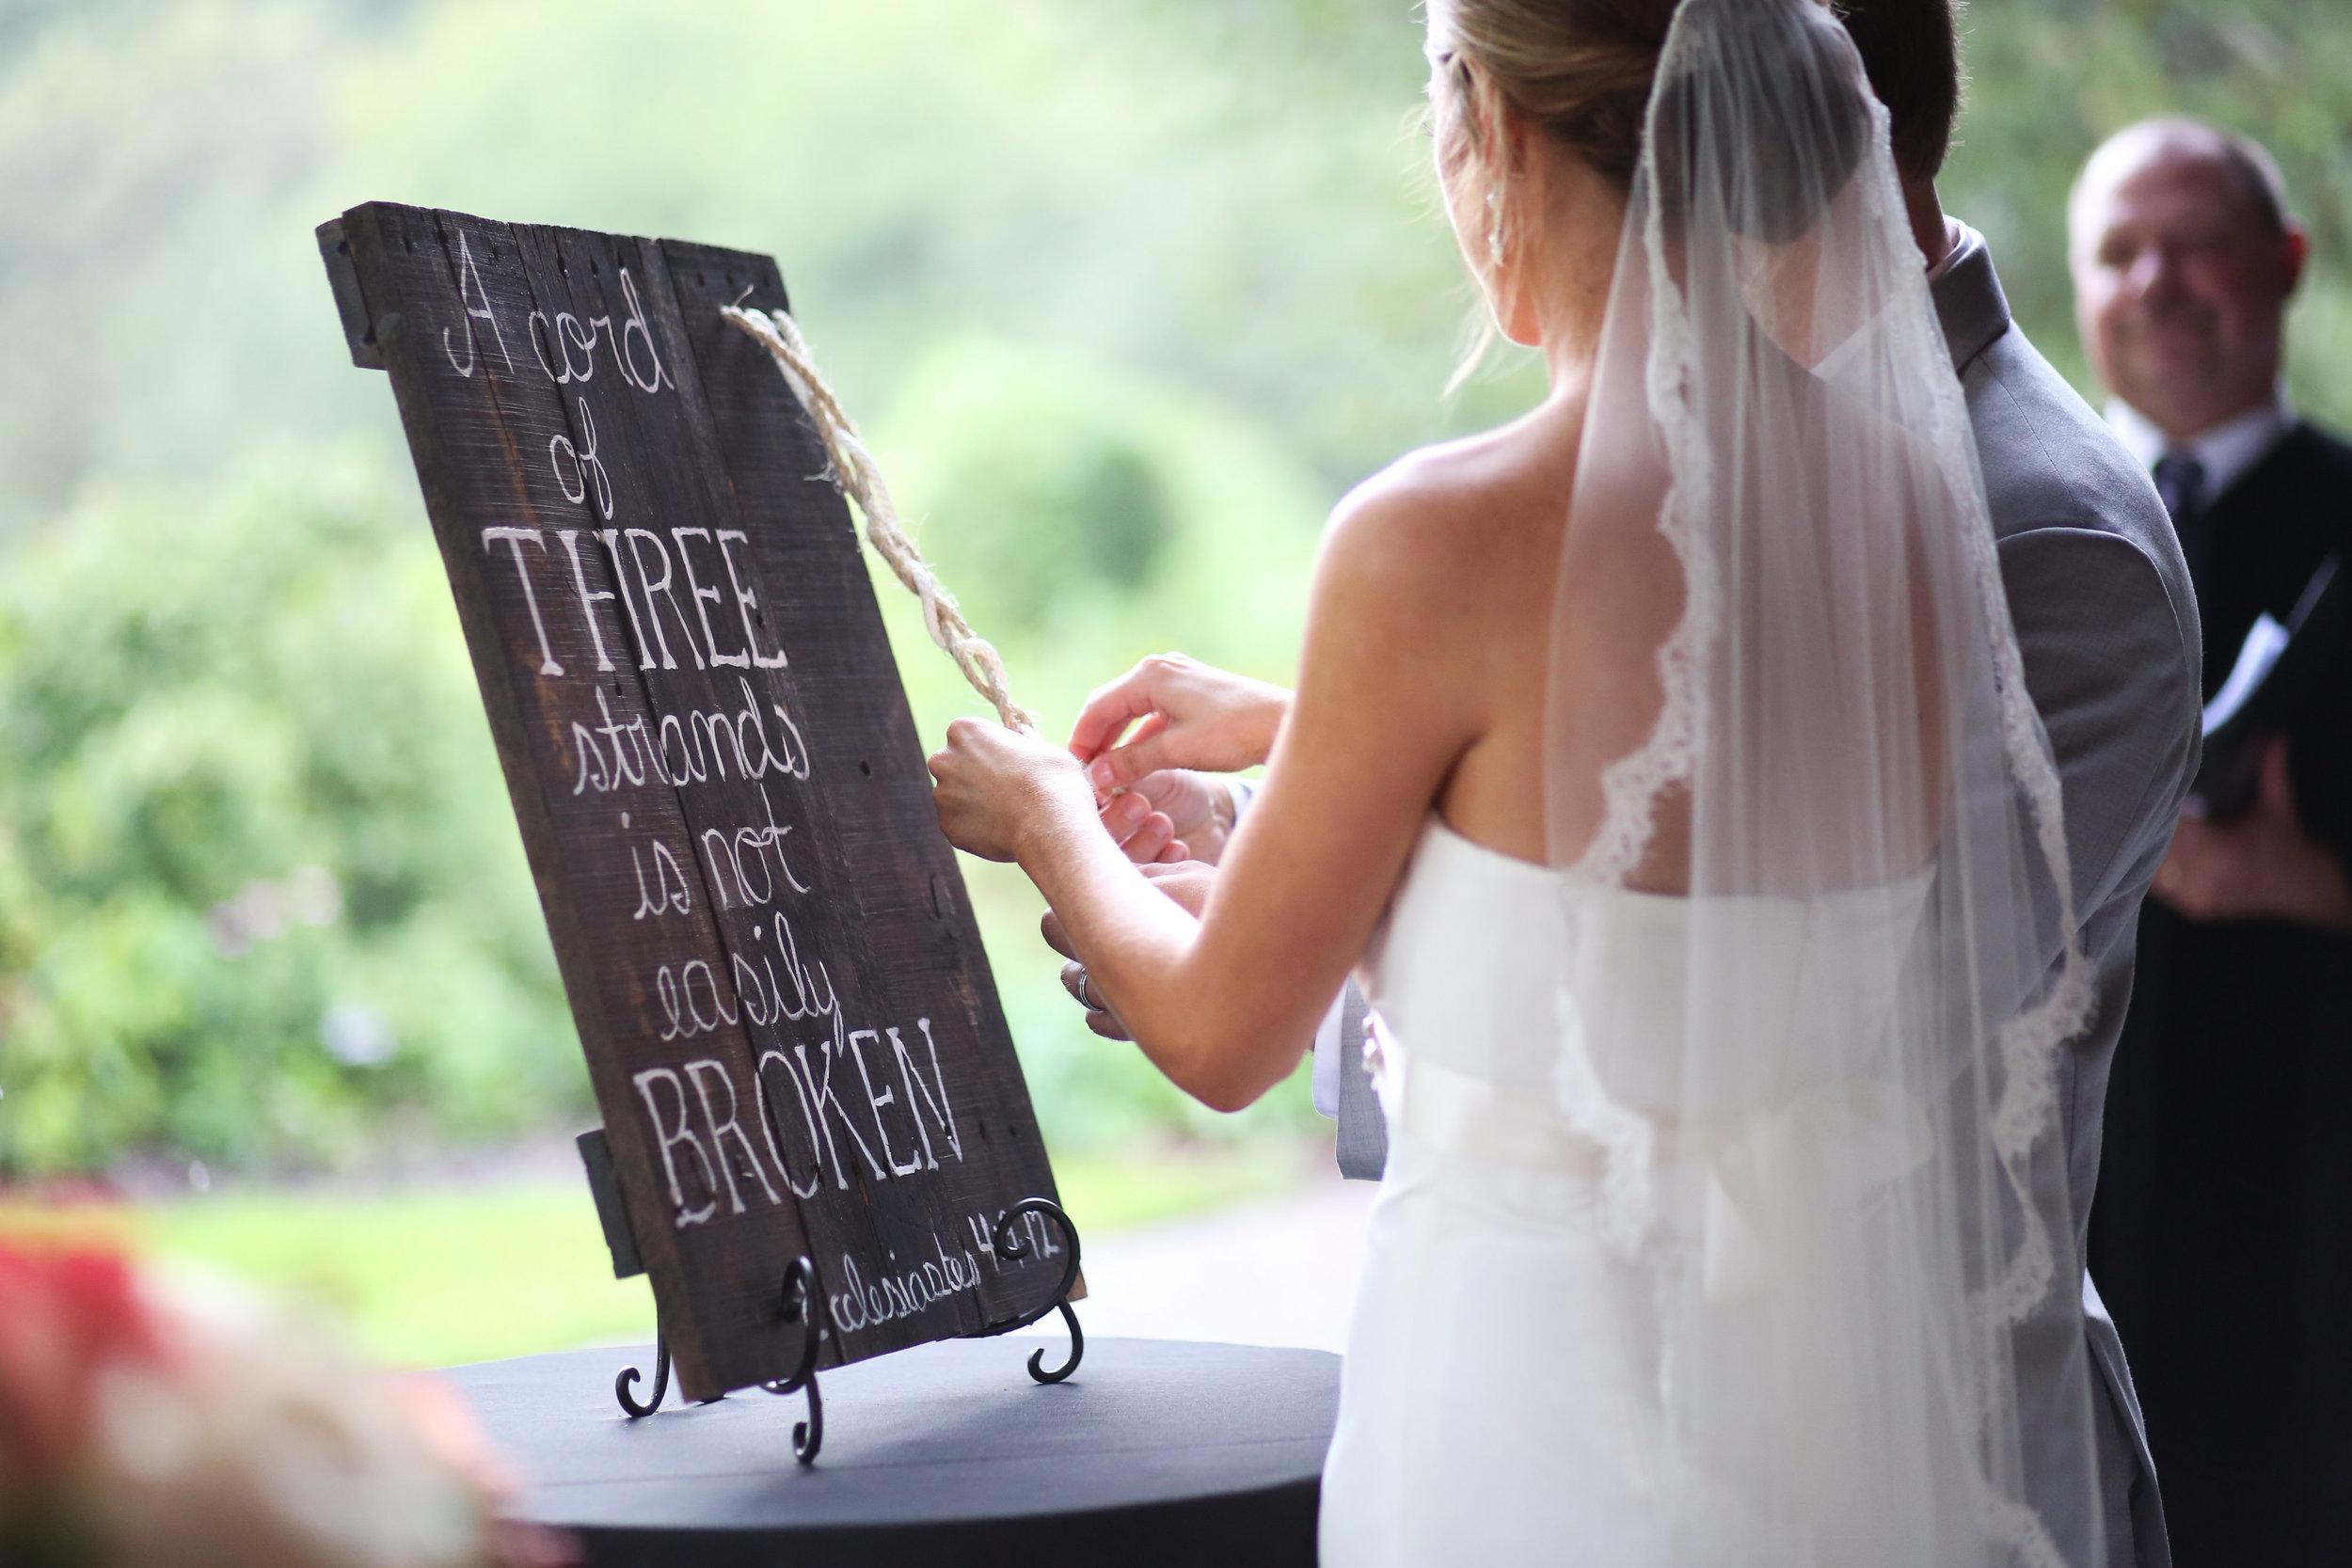 finnegan-photography-ivory-and-beau-bridal-boutique-nicole-miller-dakota-jaclyn-jordan-anne-veil-savannah-bridal-boutique-savannah-wedding-dresses-savannah-weddings-statesboro-wedding-barn-wedding-savannah-bridal-georgia-bridal-boutique-14.jpg